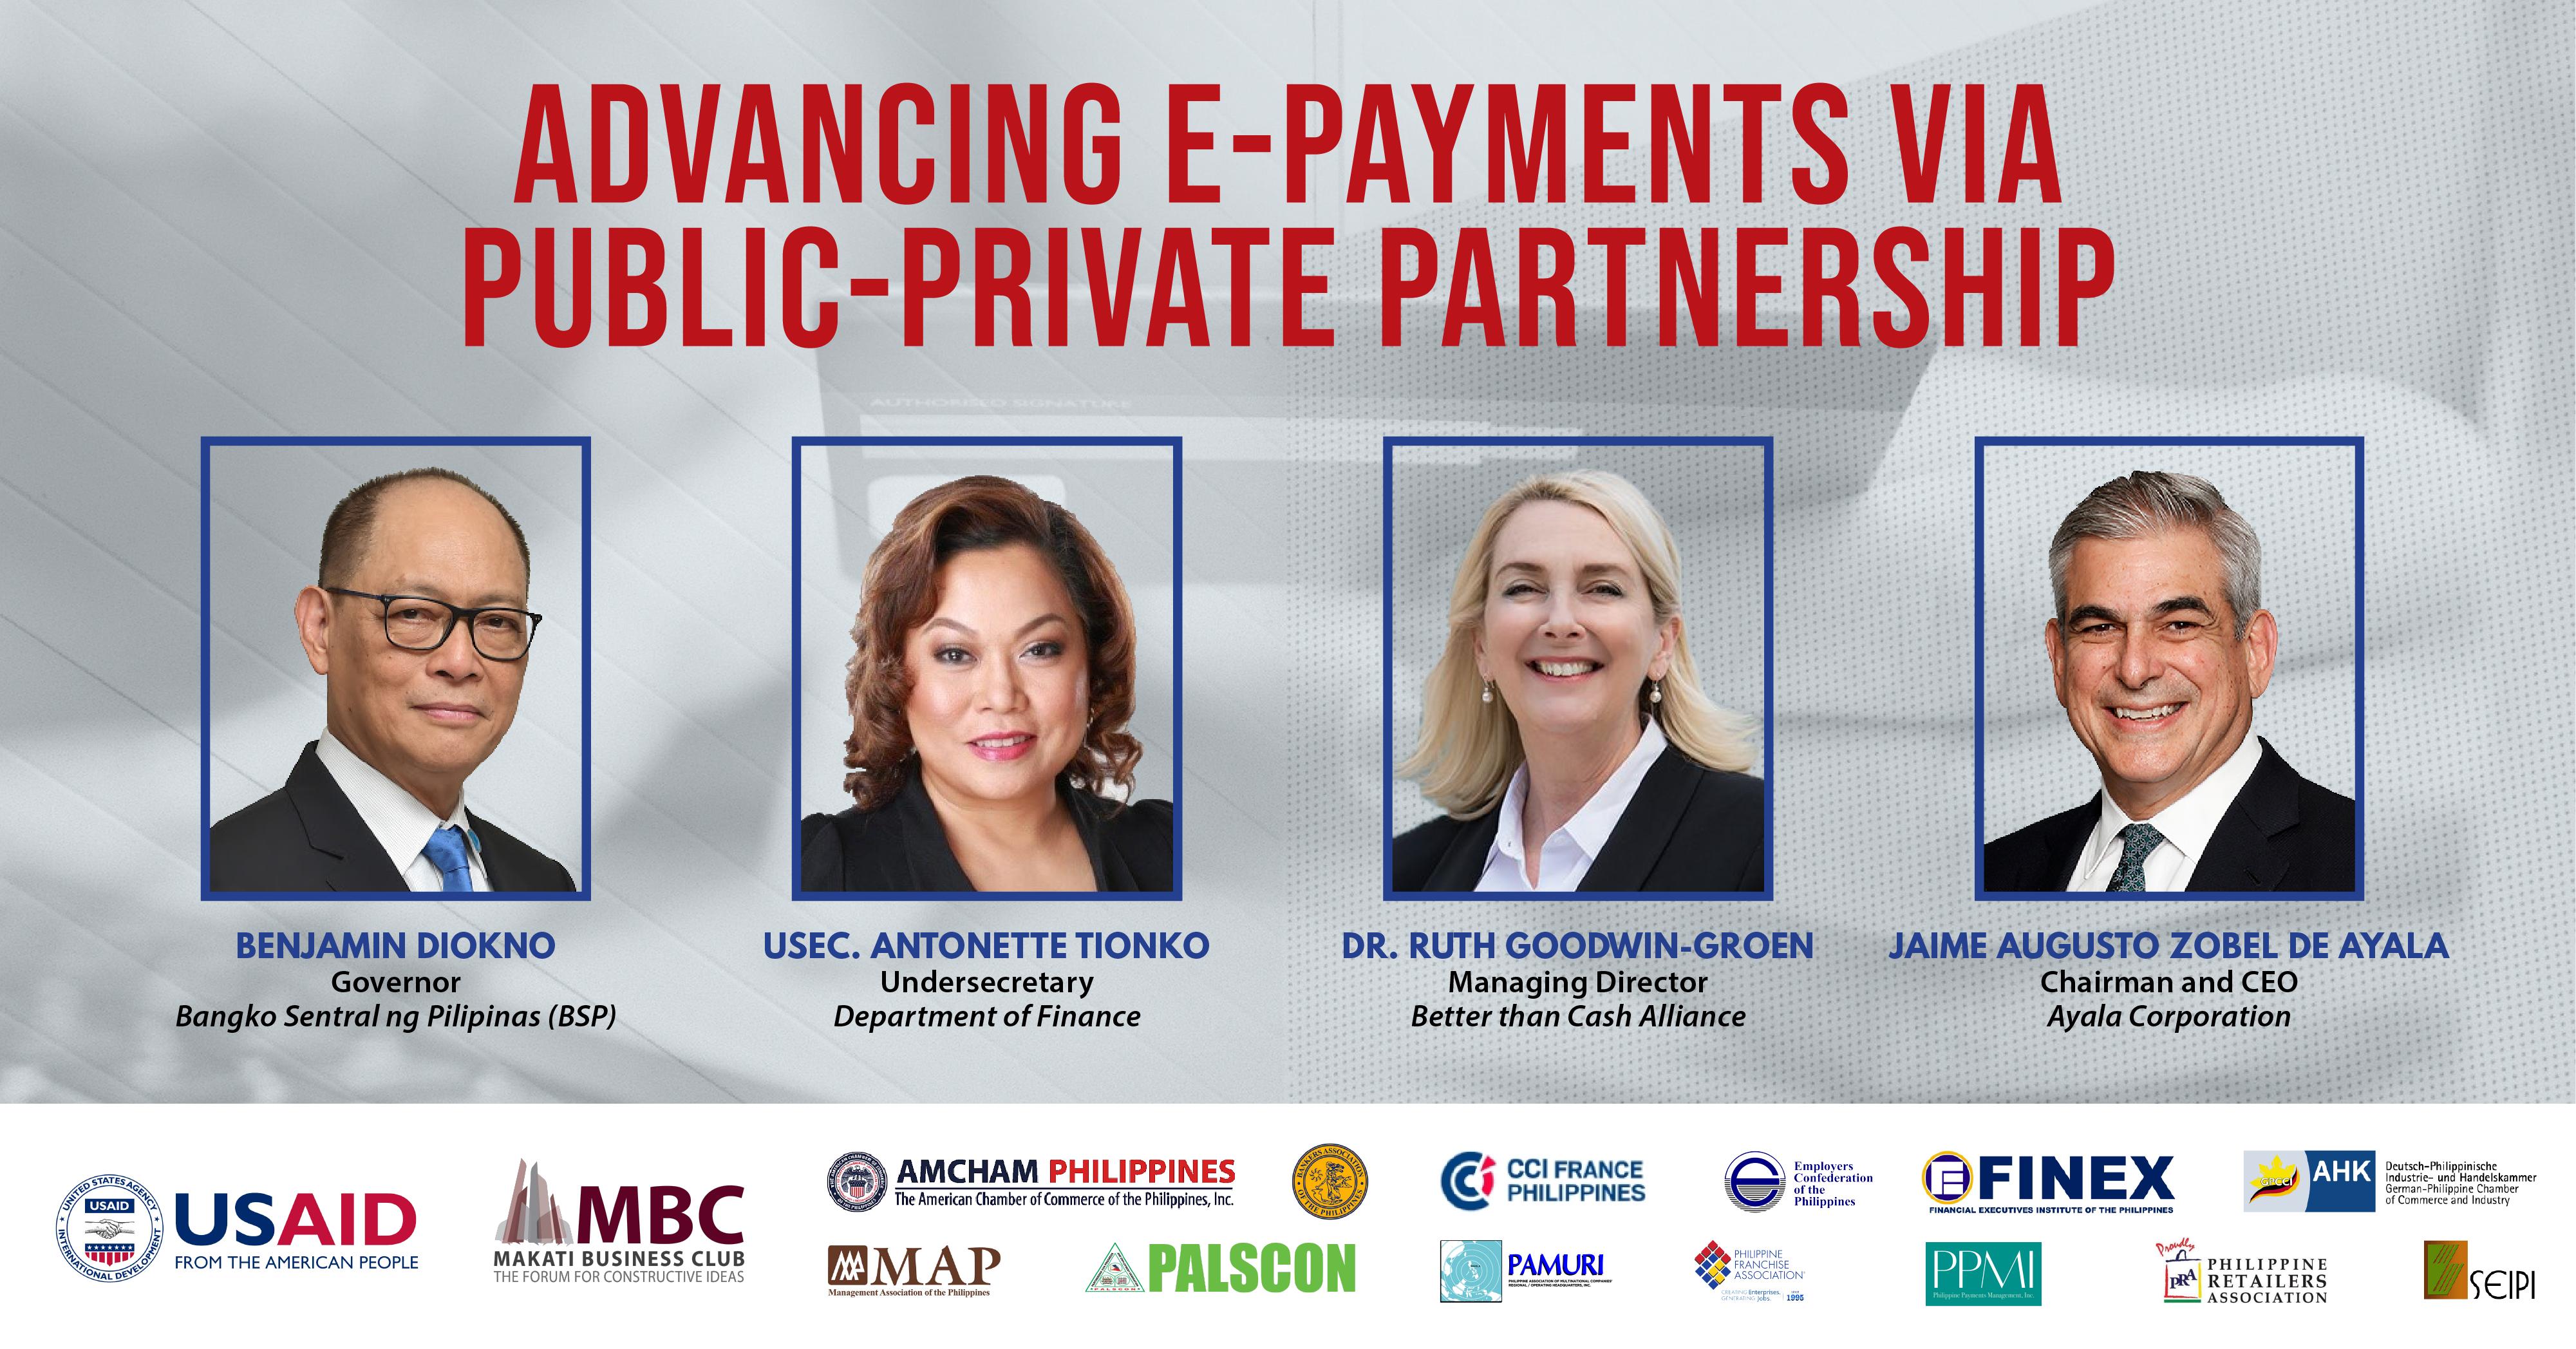 Advancing E-Payments via Public-Private Partnership